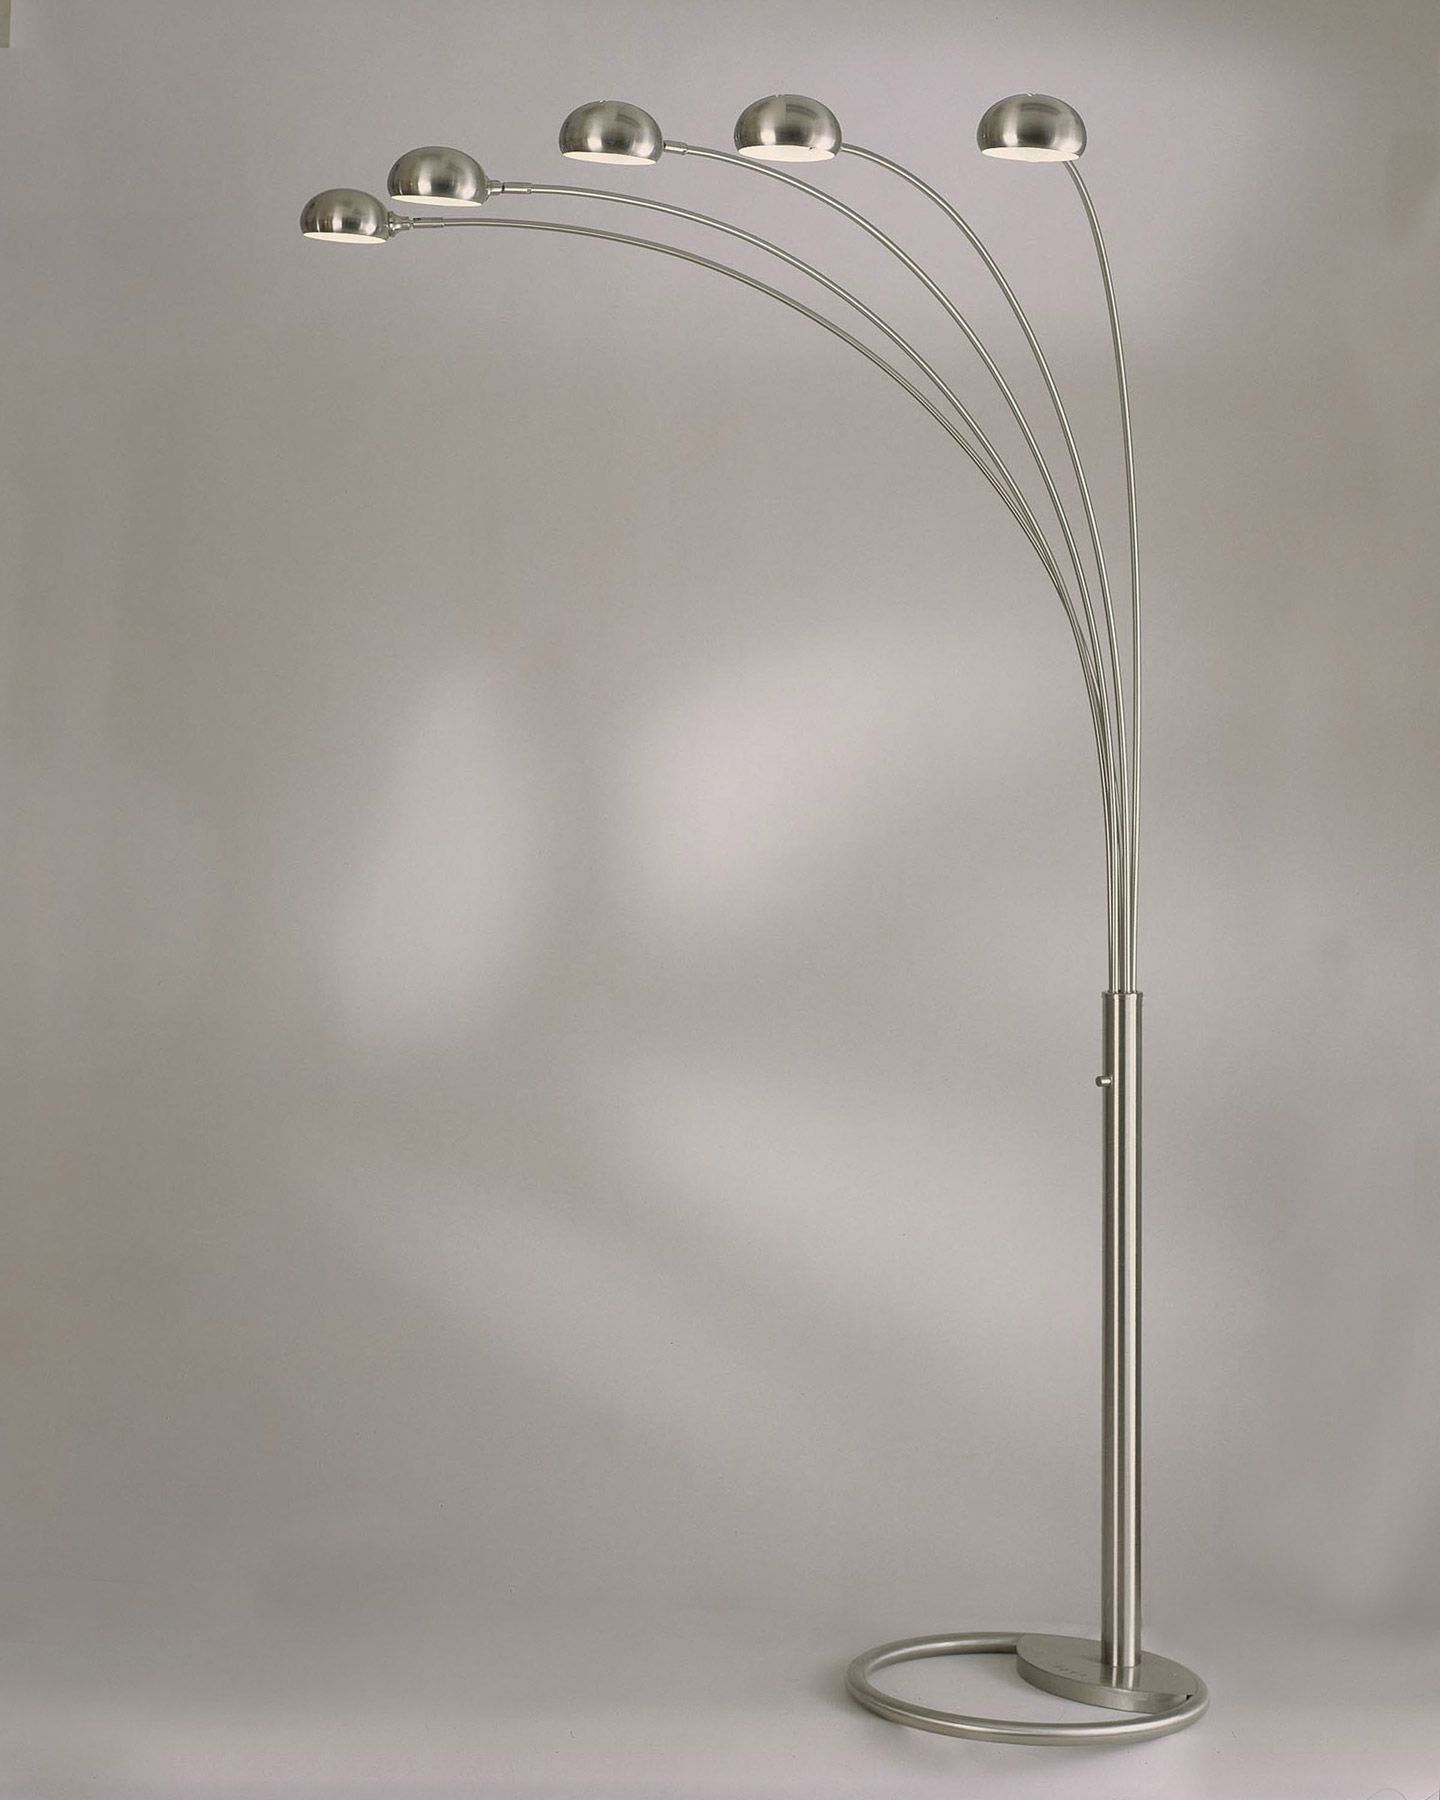 Nova Lighting 4231rx Mushroom 5 Light Arc Floor Lamp